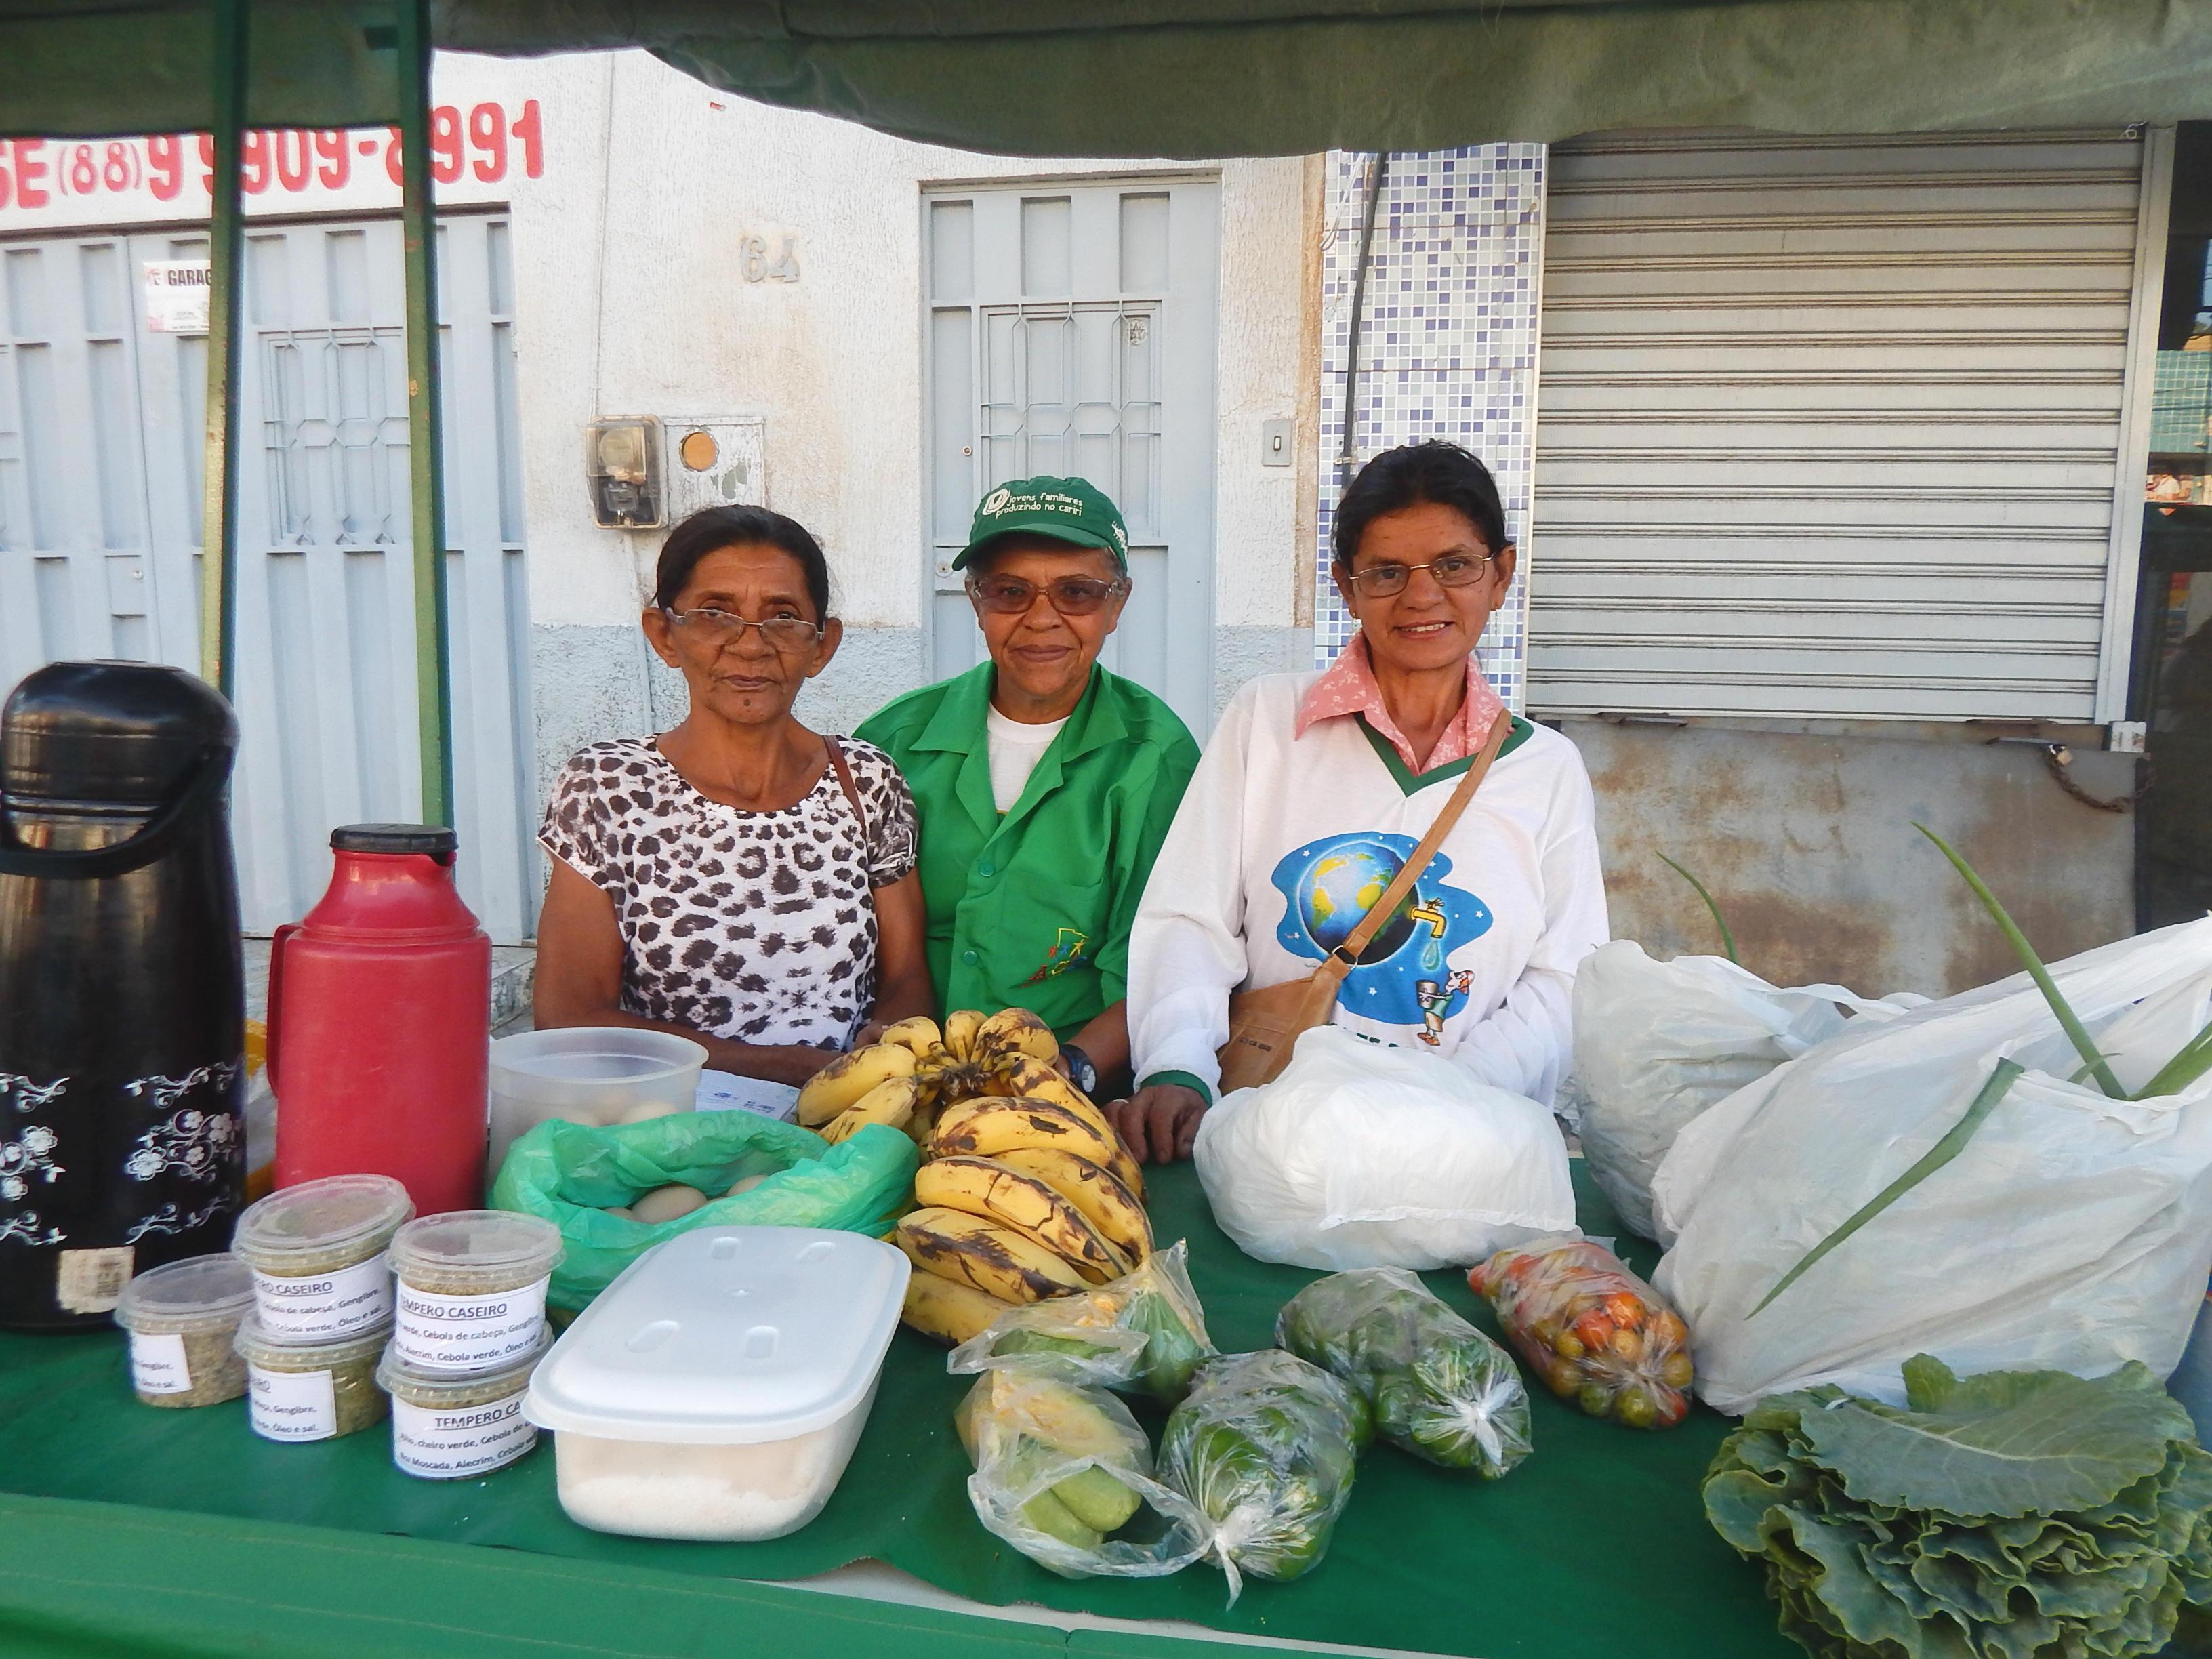 Feira_Agroecológica_Crato_-_Fátima